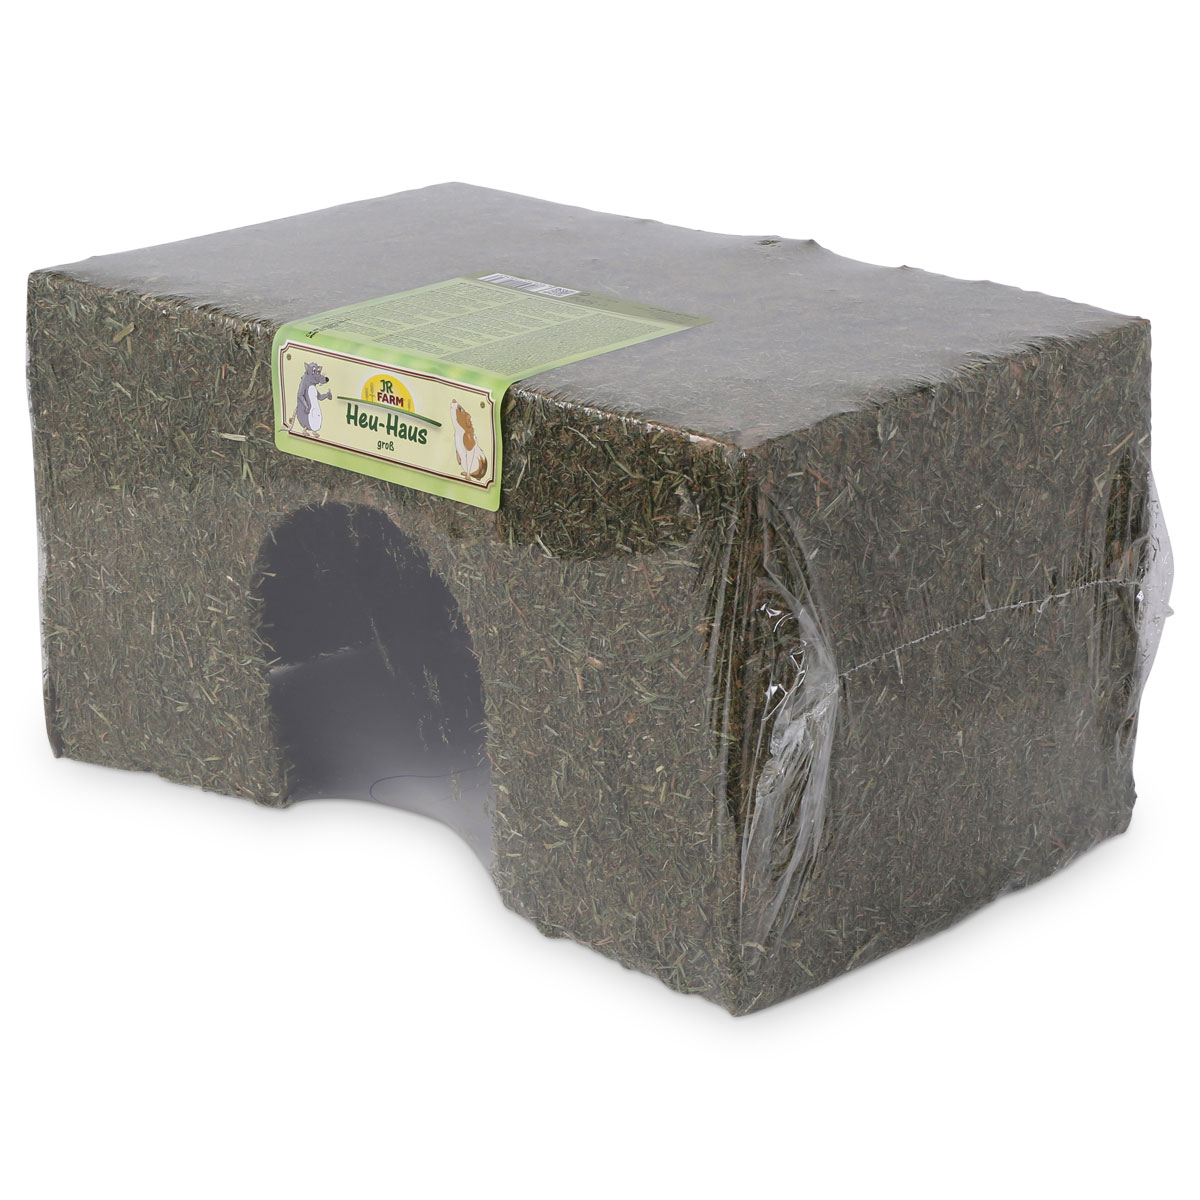 jr farm heu haus f r nager g nstig kaufen bei zooroyal. Black Bedroom Furniture Sets. Home Design Ideas